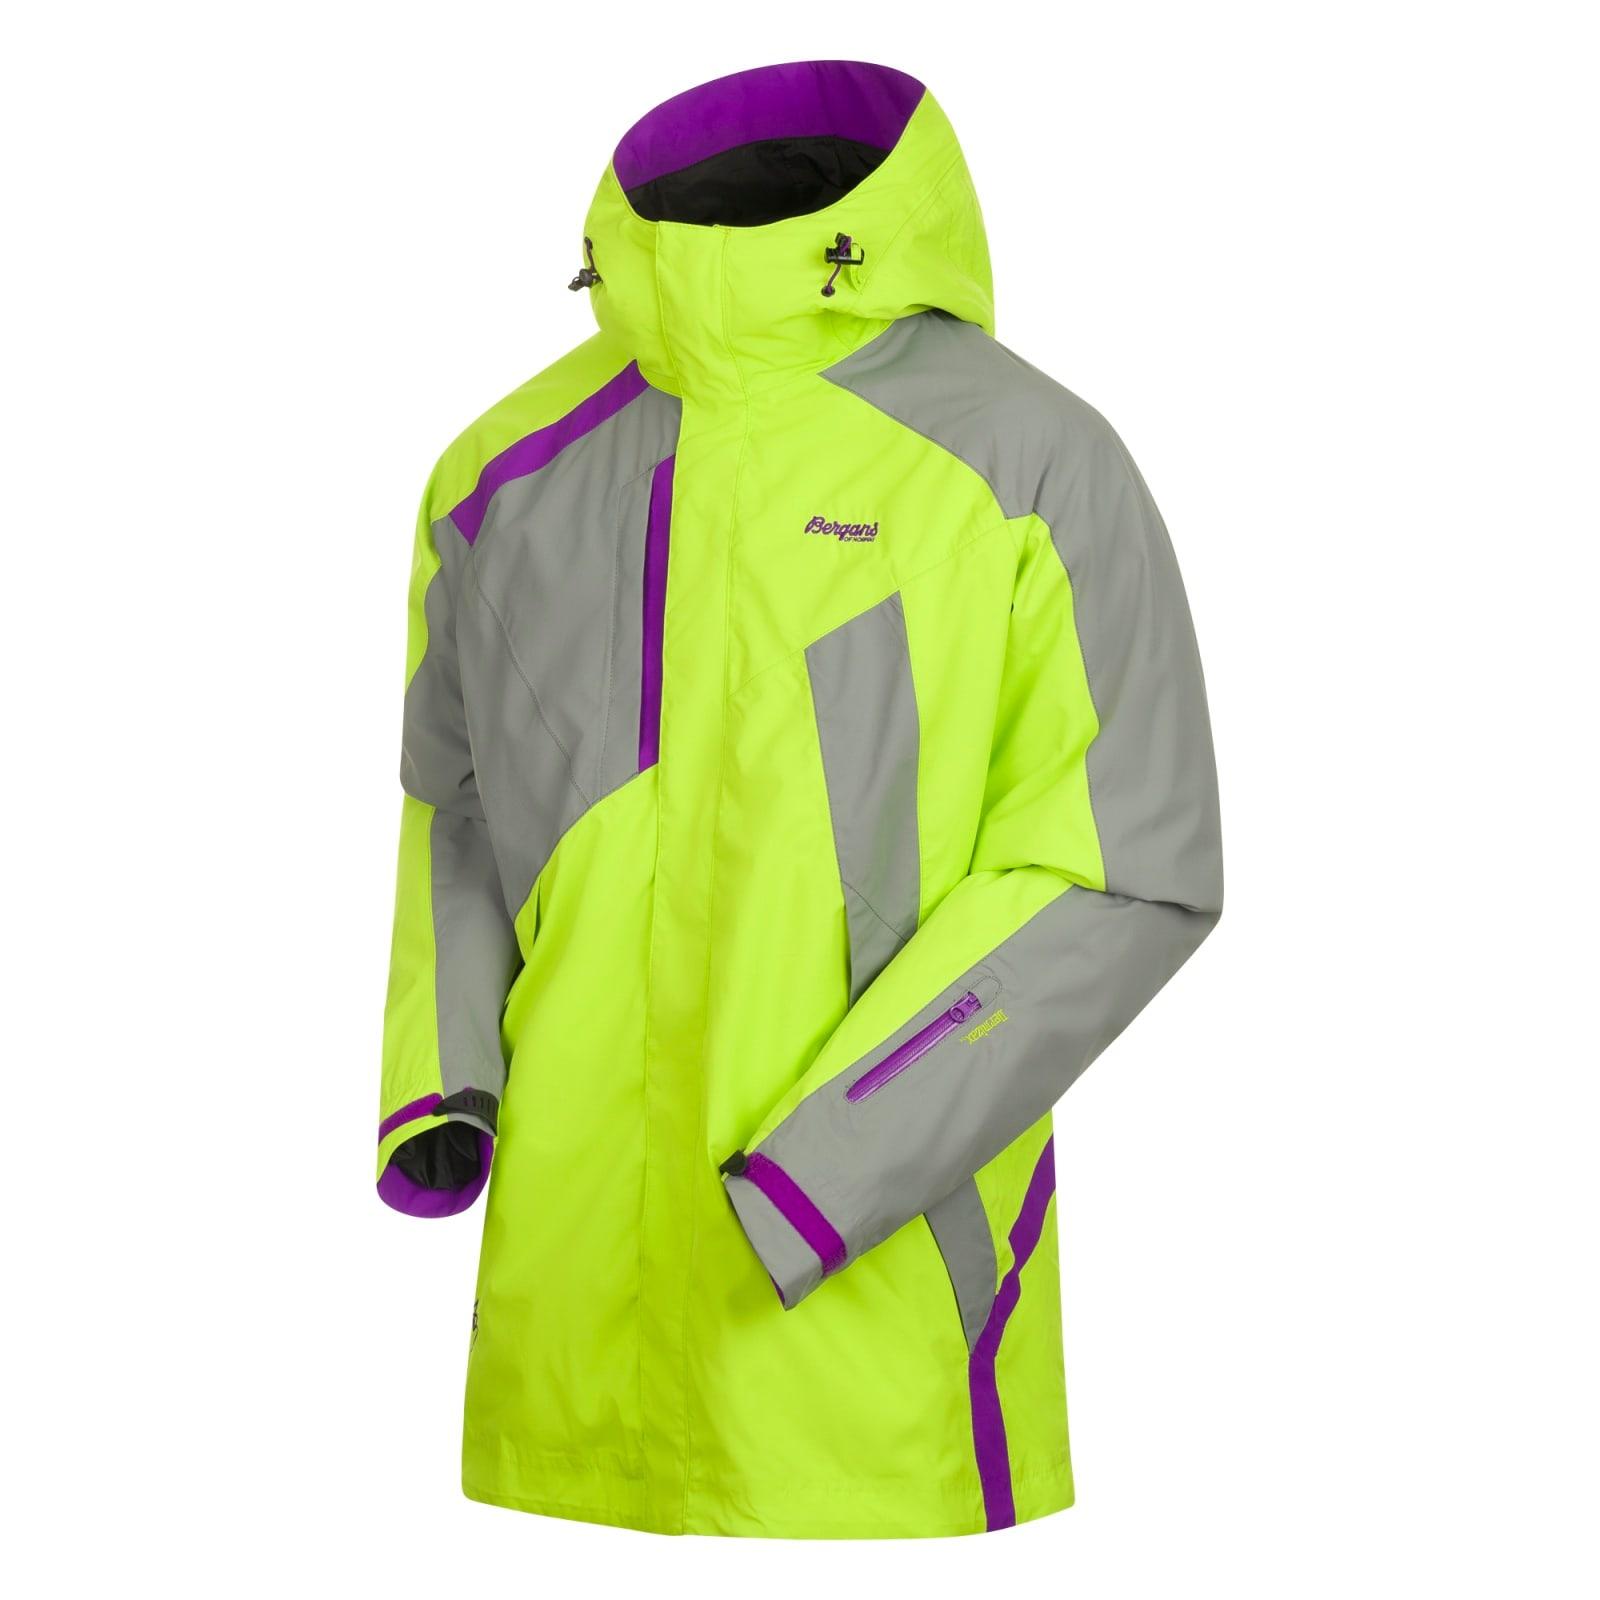 Kjøp Bergans Vikersund Insulated Huge Jacket fra Outnorth